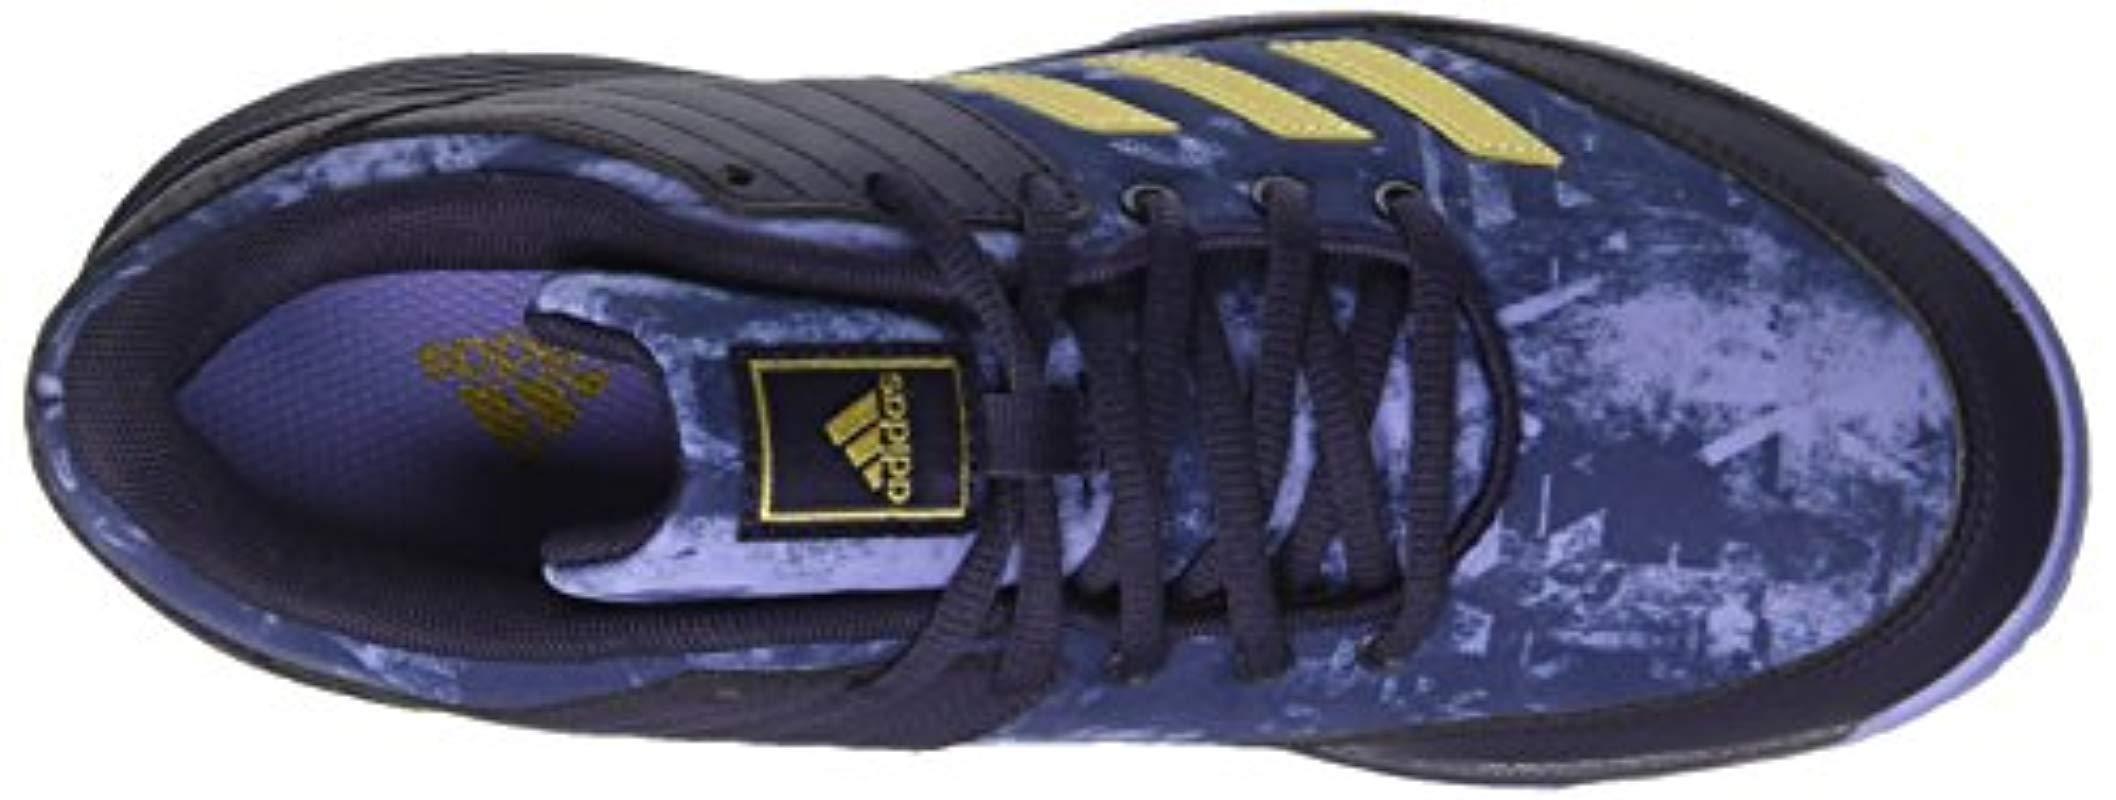 official photos 25696 f5351 Lyst - Ligra 5 W, Zapatillas de Voleibol para Mujer adidas de color Azul